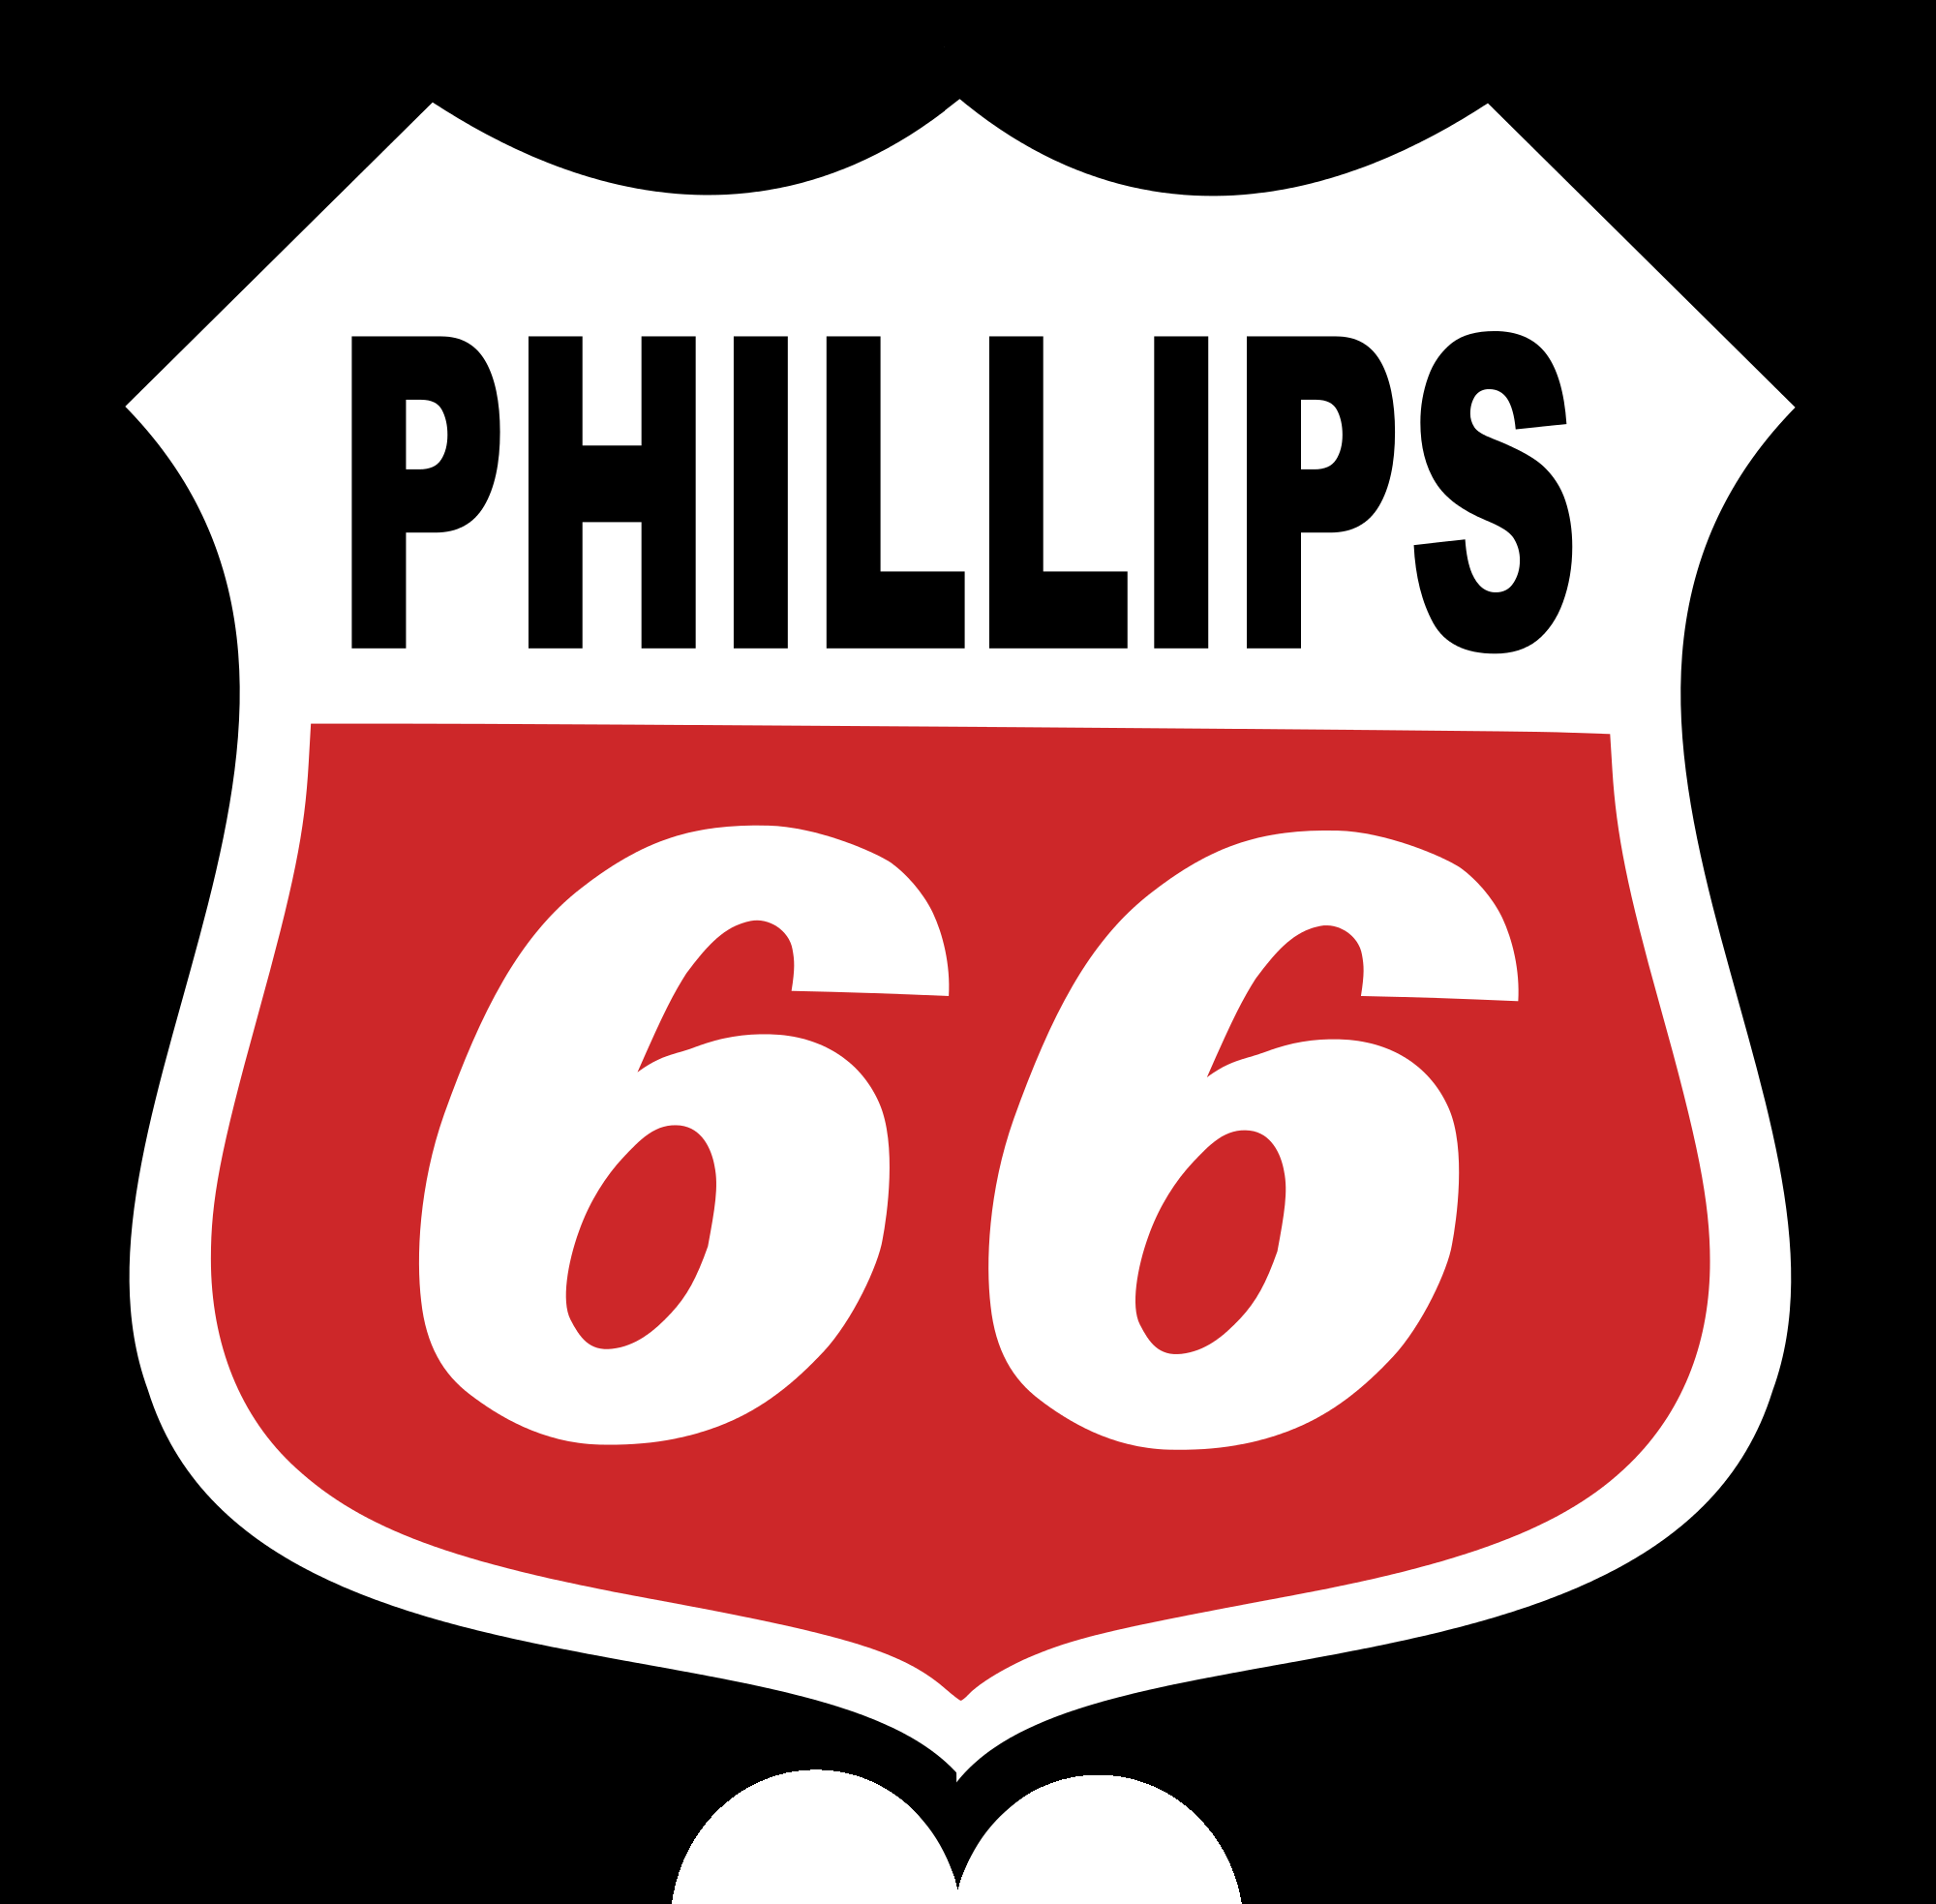 Phillips 66 Philgear Industrial Lube 150 Cross Ref